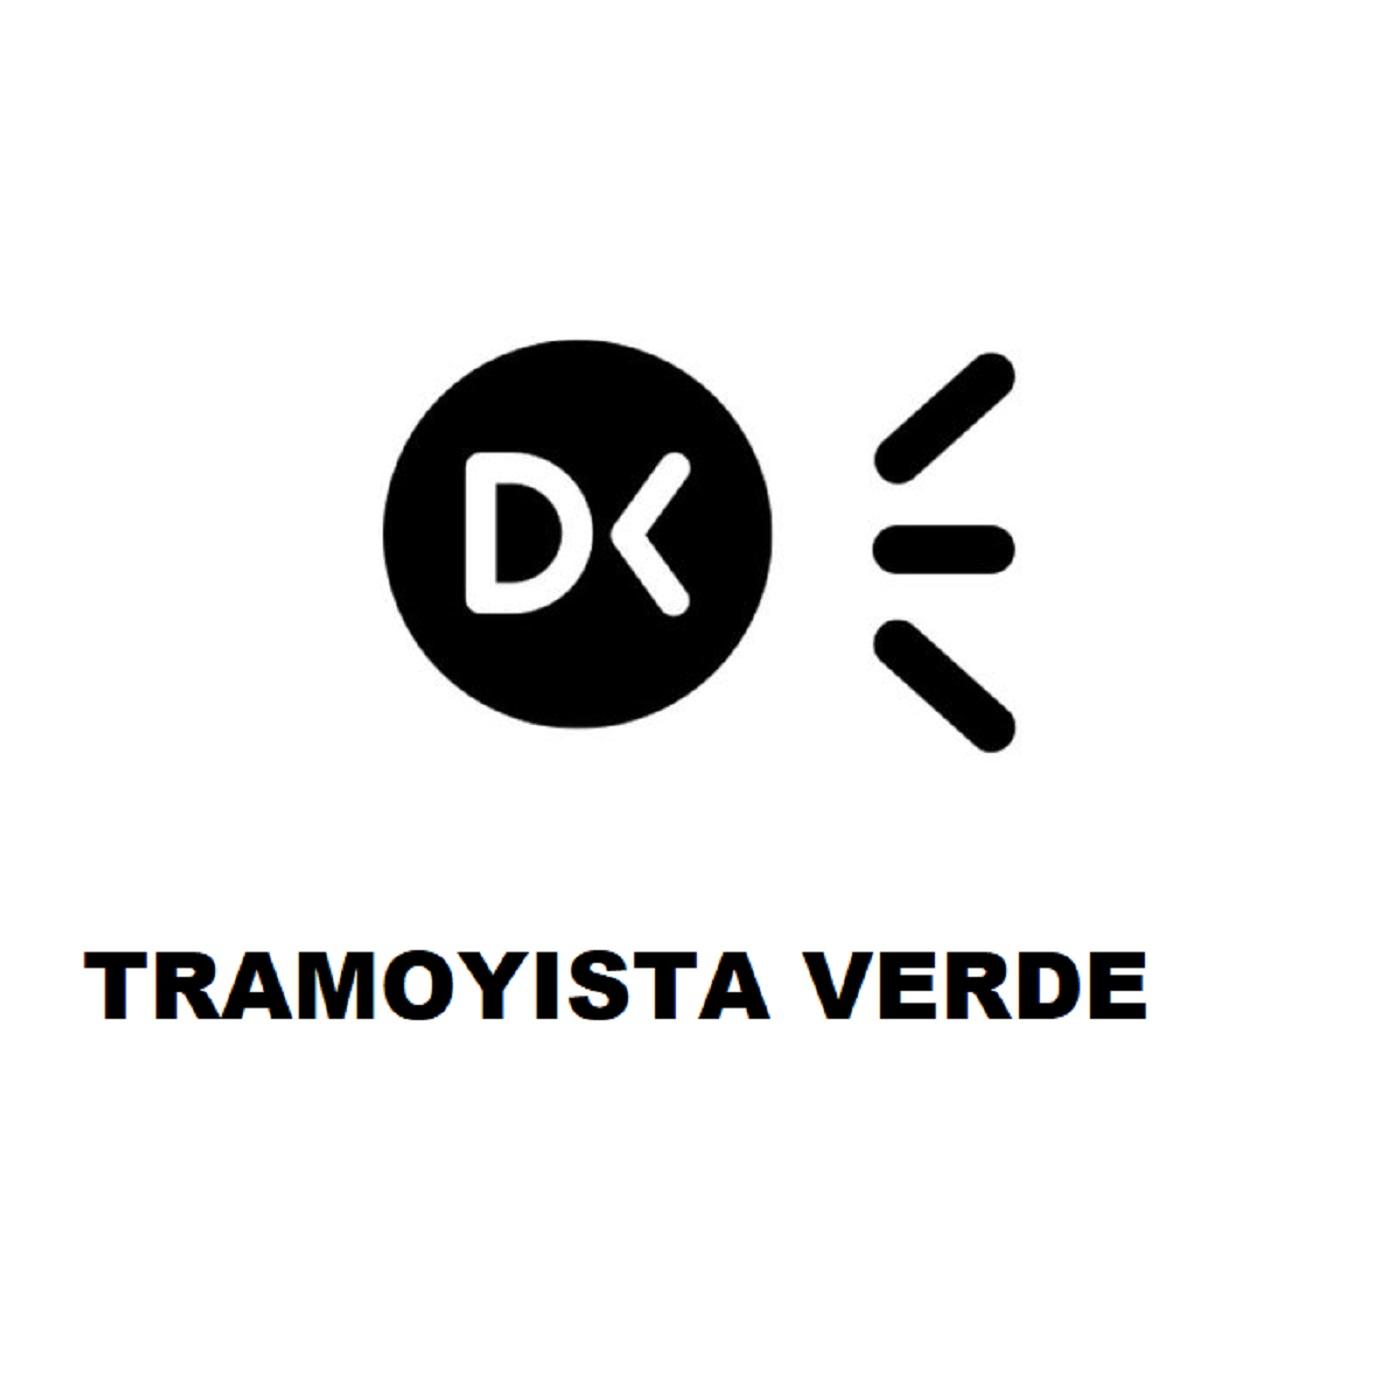 Artwork for podcast El Tramoyista Verde